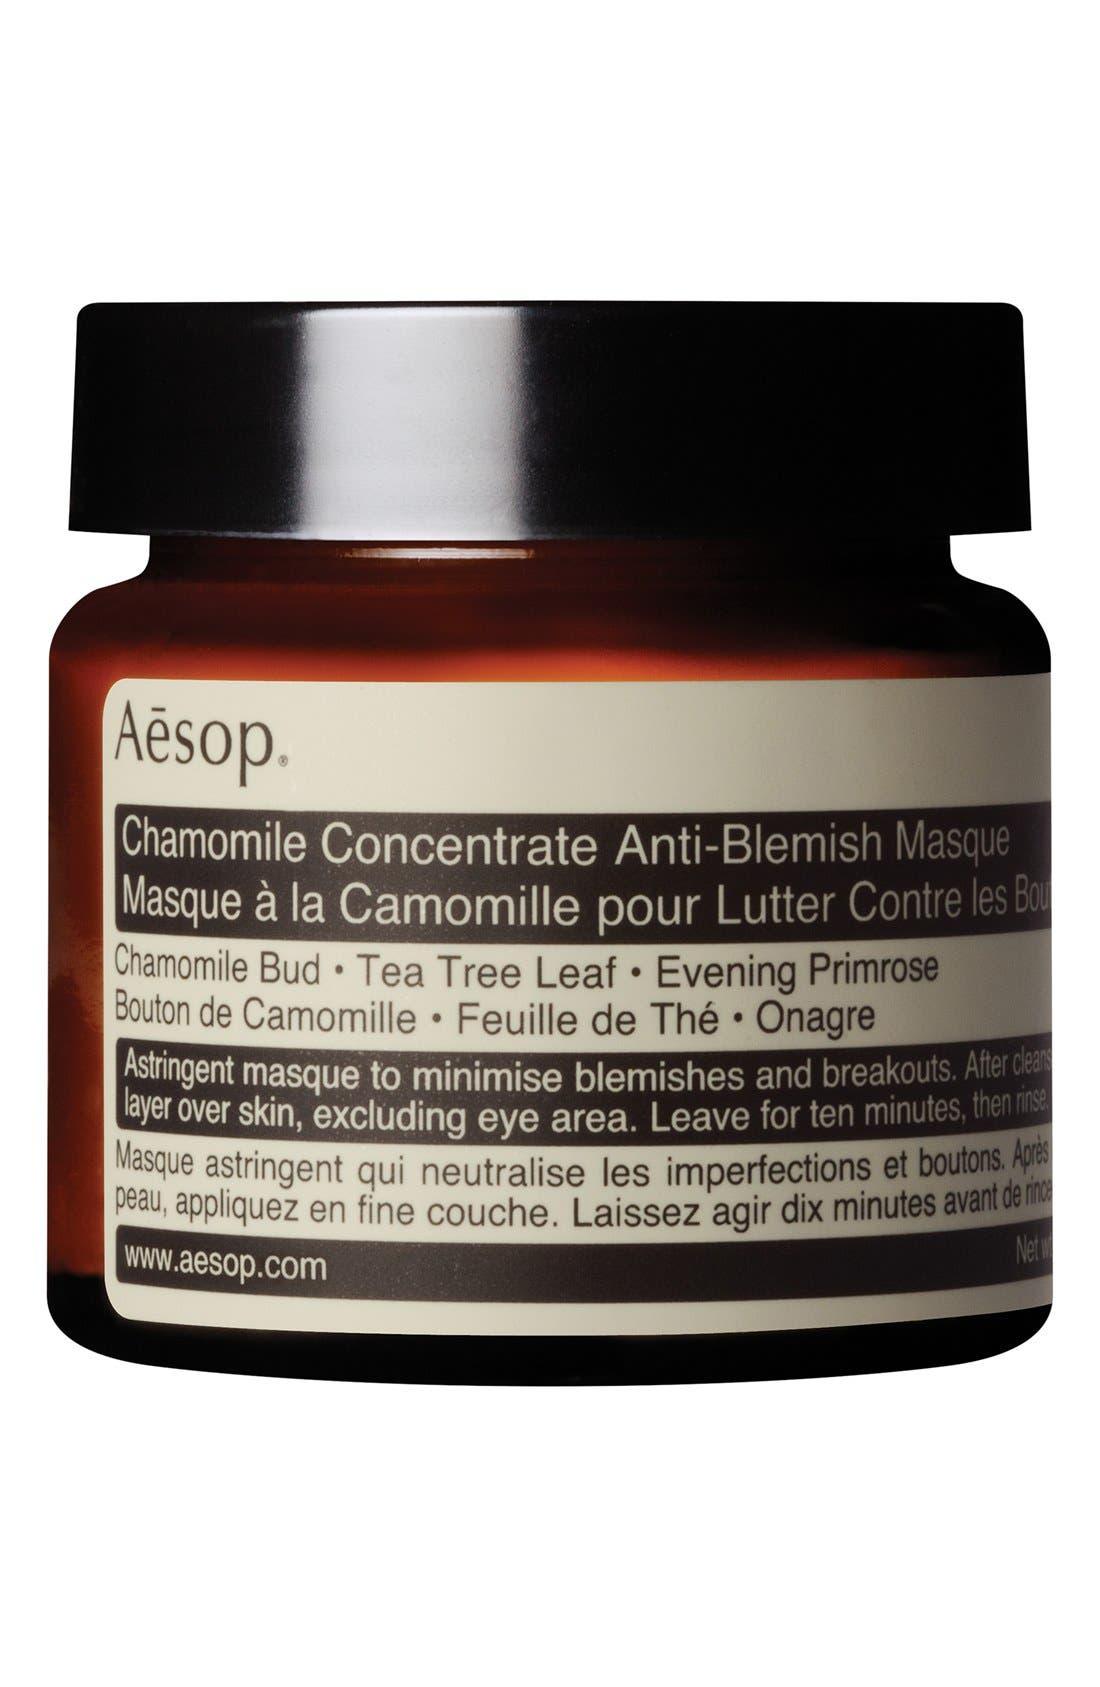 Aesop Chamomile Concentrate Anti-Blemish Masque